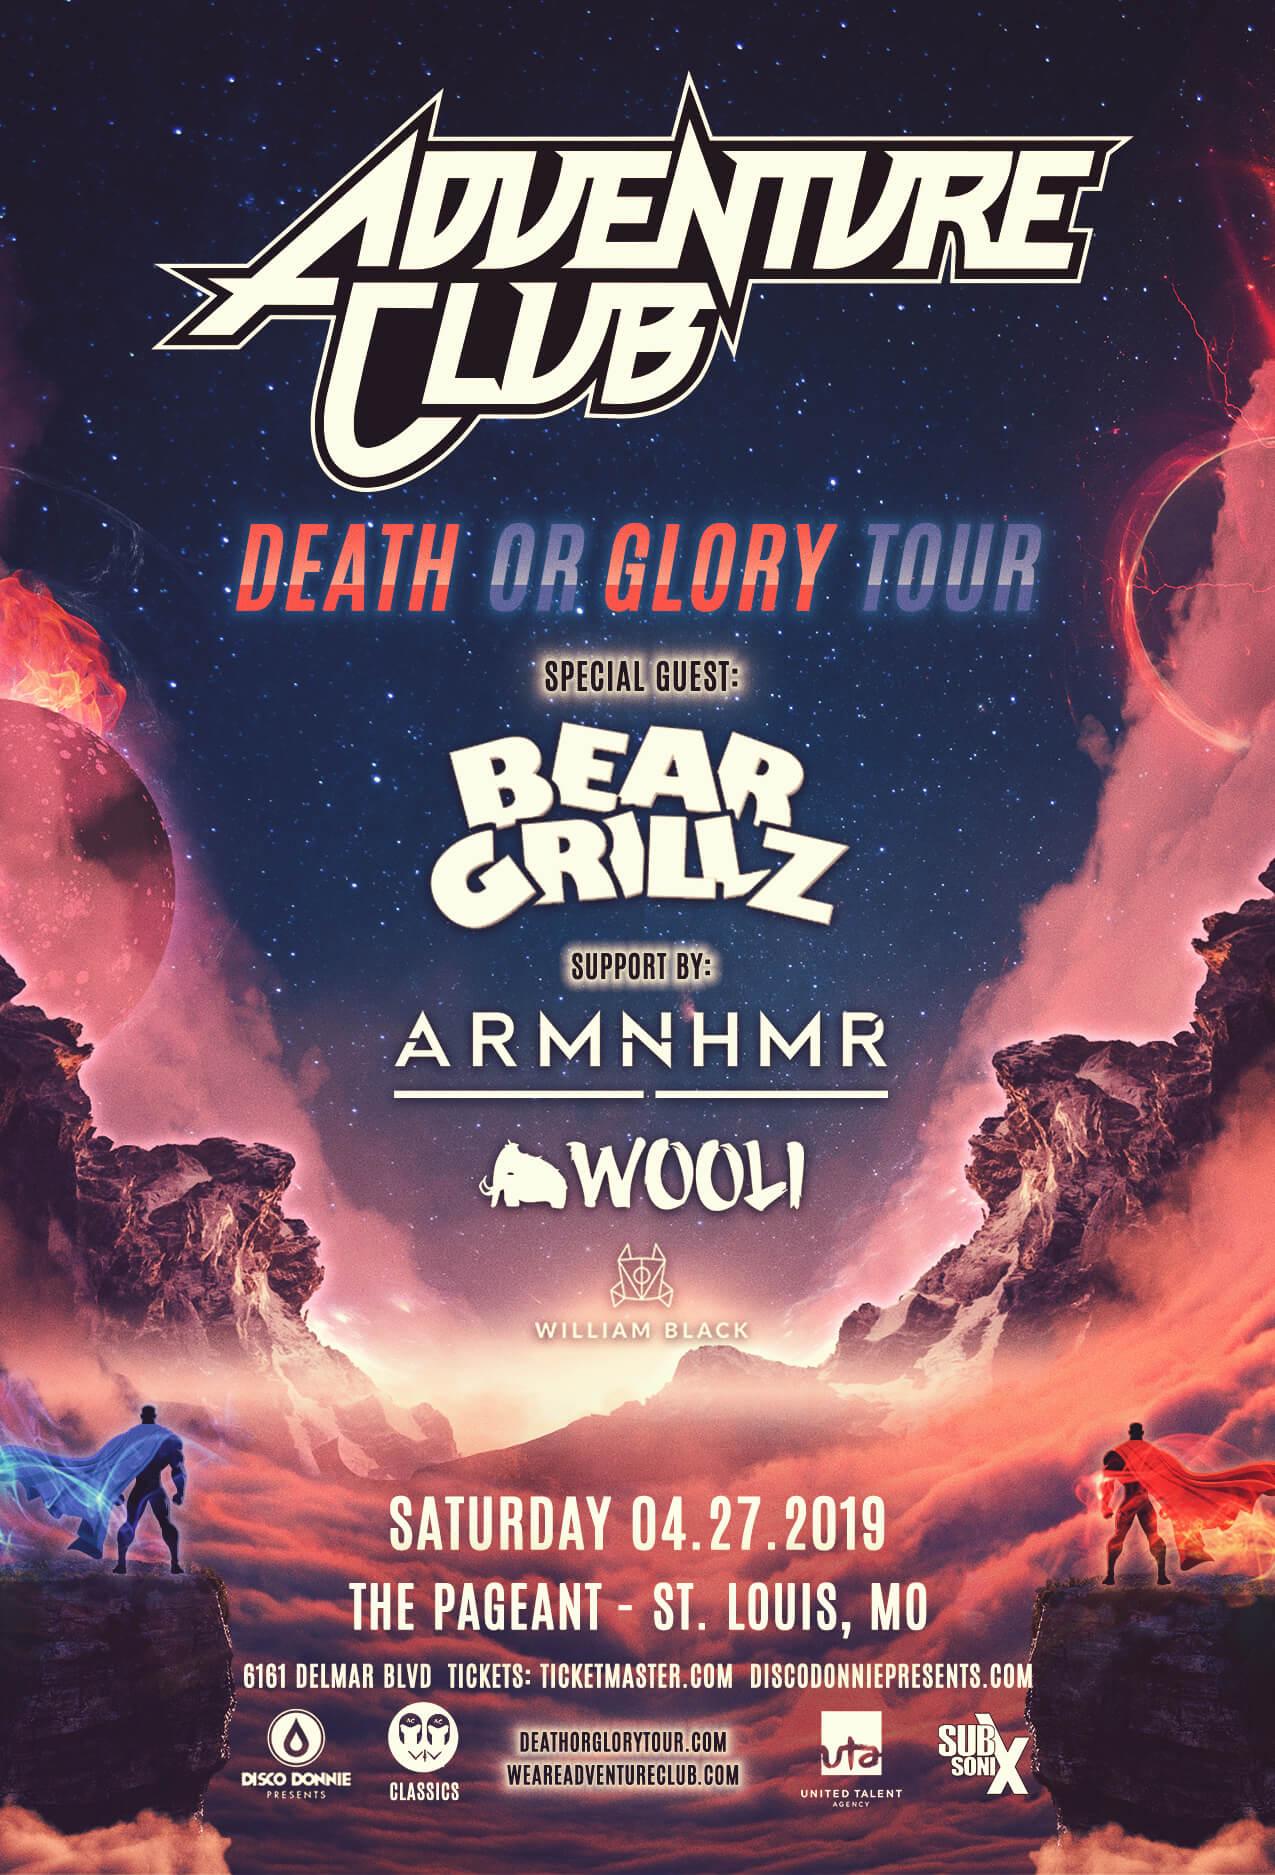 Adventure Club, Bear Grillz, ARMNHMR, Wooli, William Black in St Louis